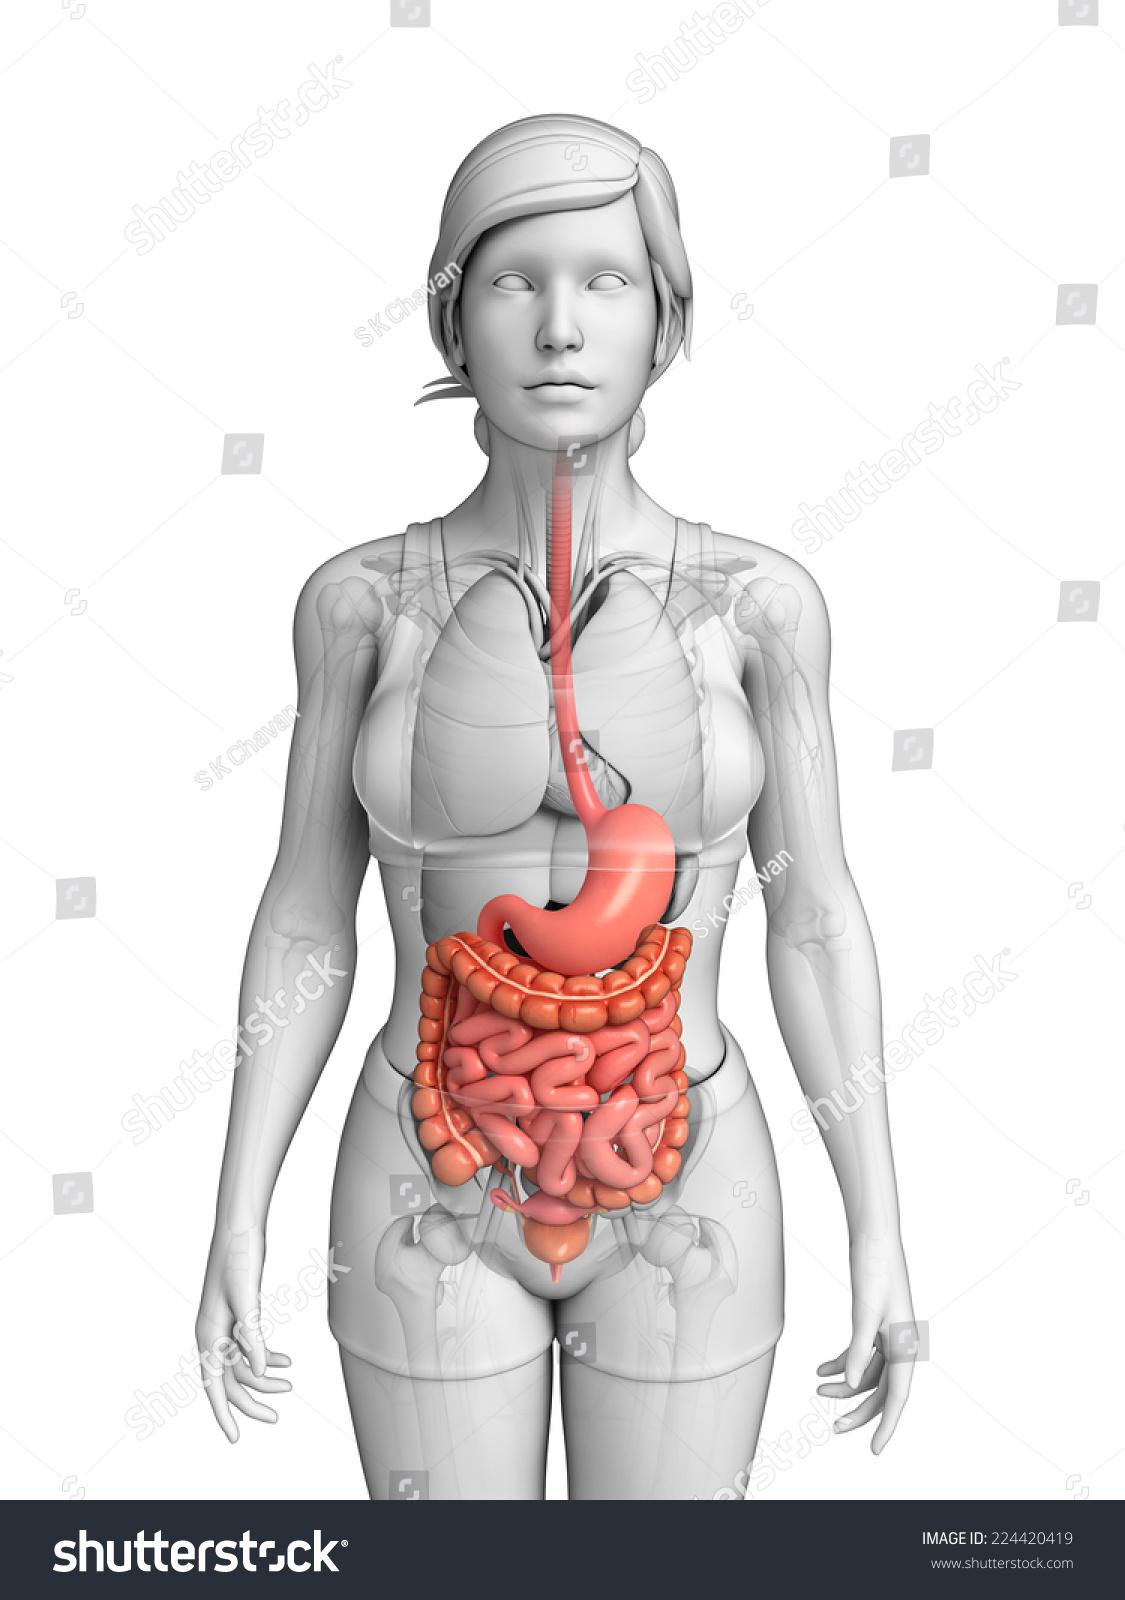 Small Bowel Anatomy Gallery - human body anatomy